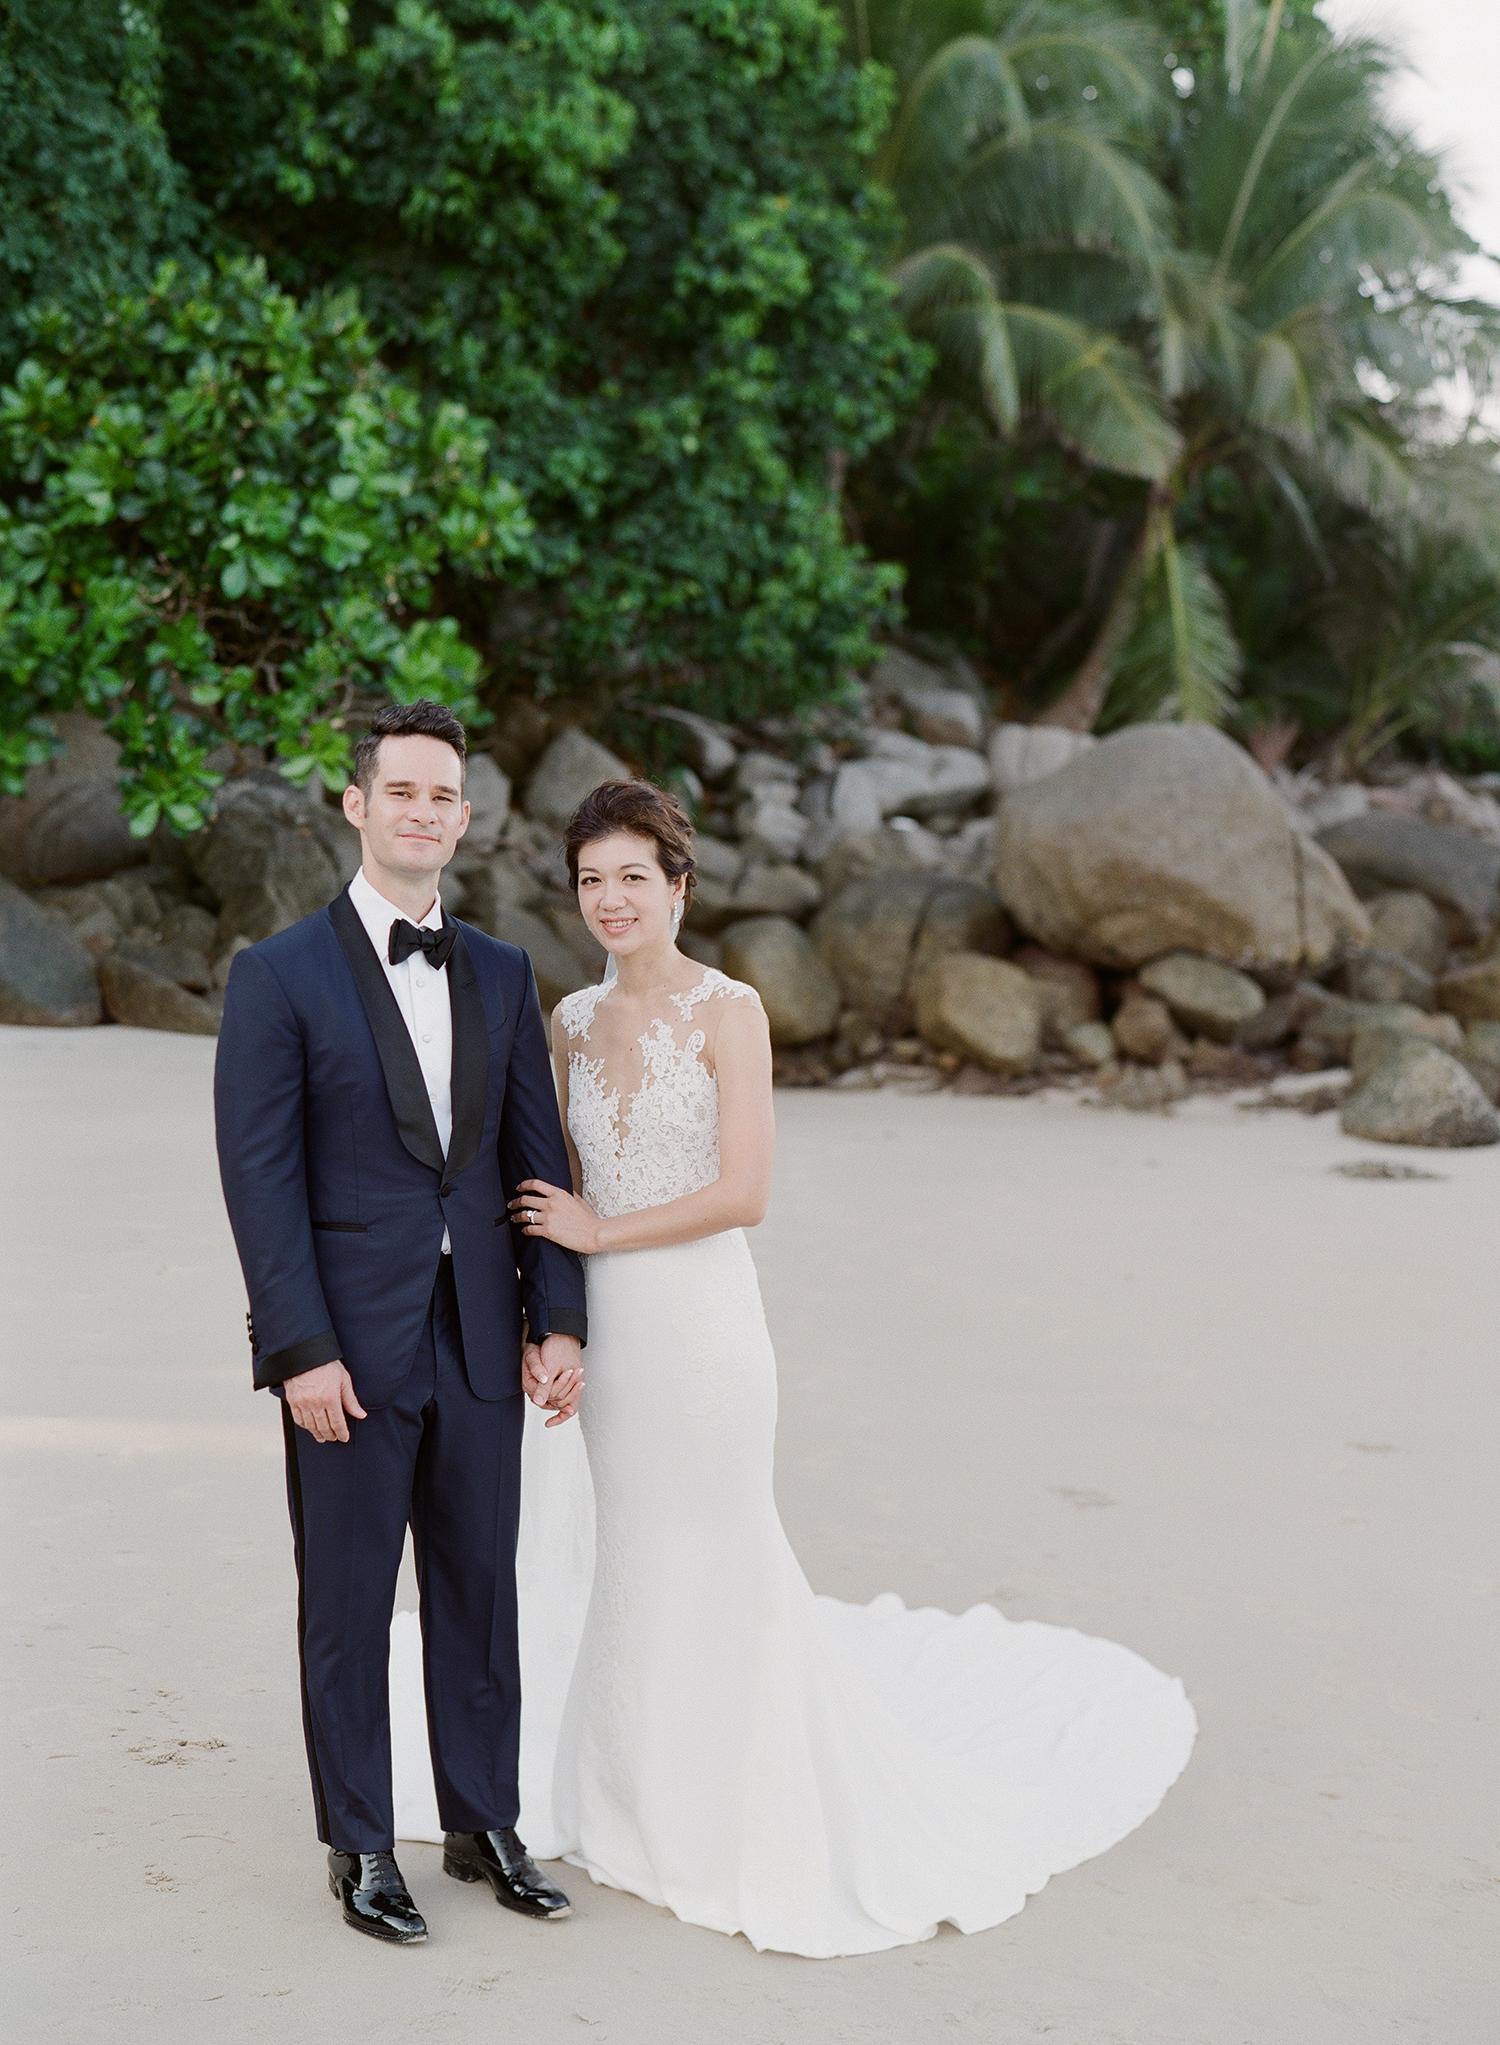 stacy brad wedding thailand couple on the beach